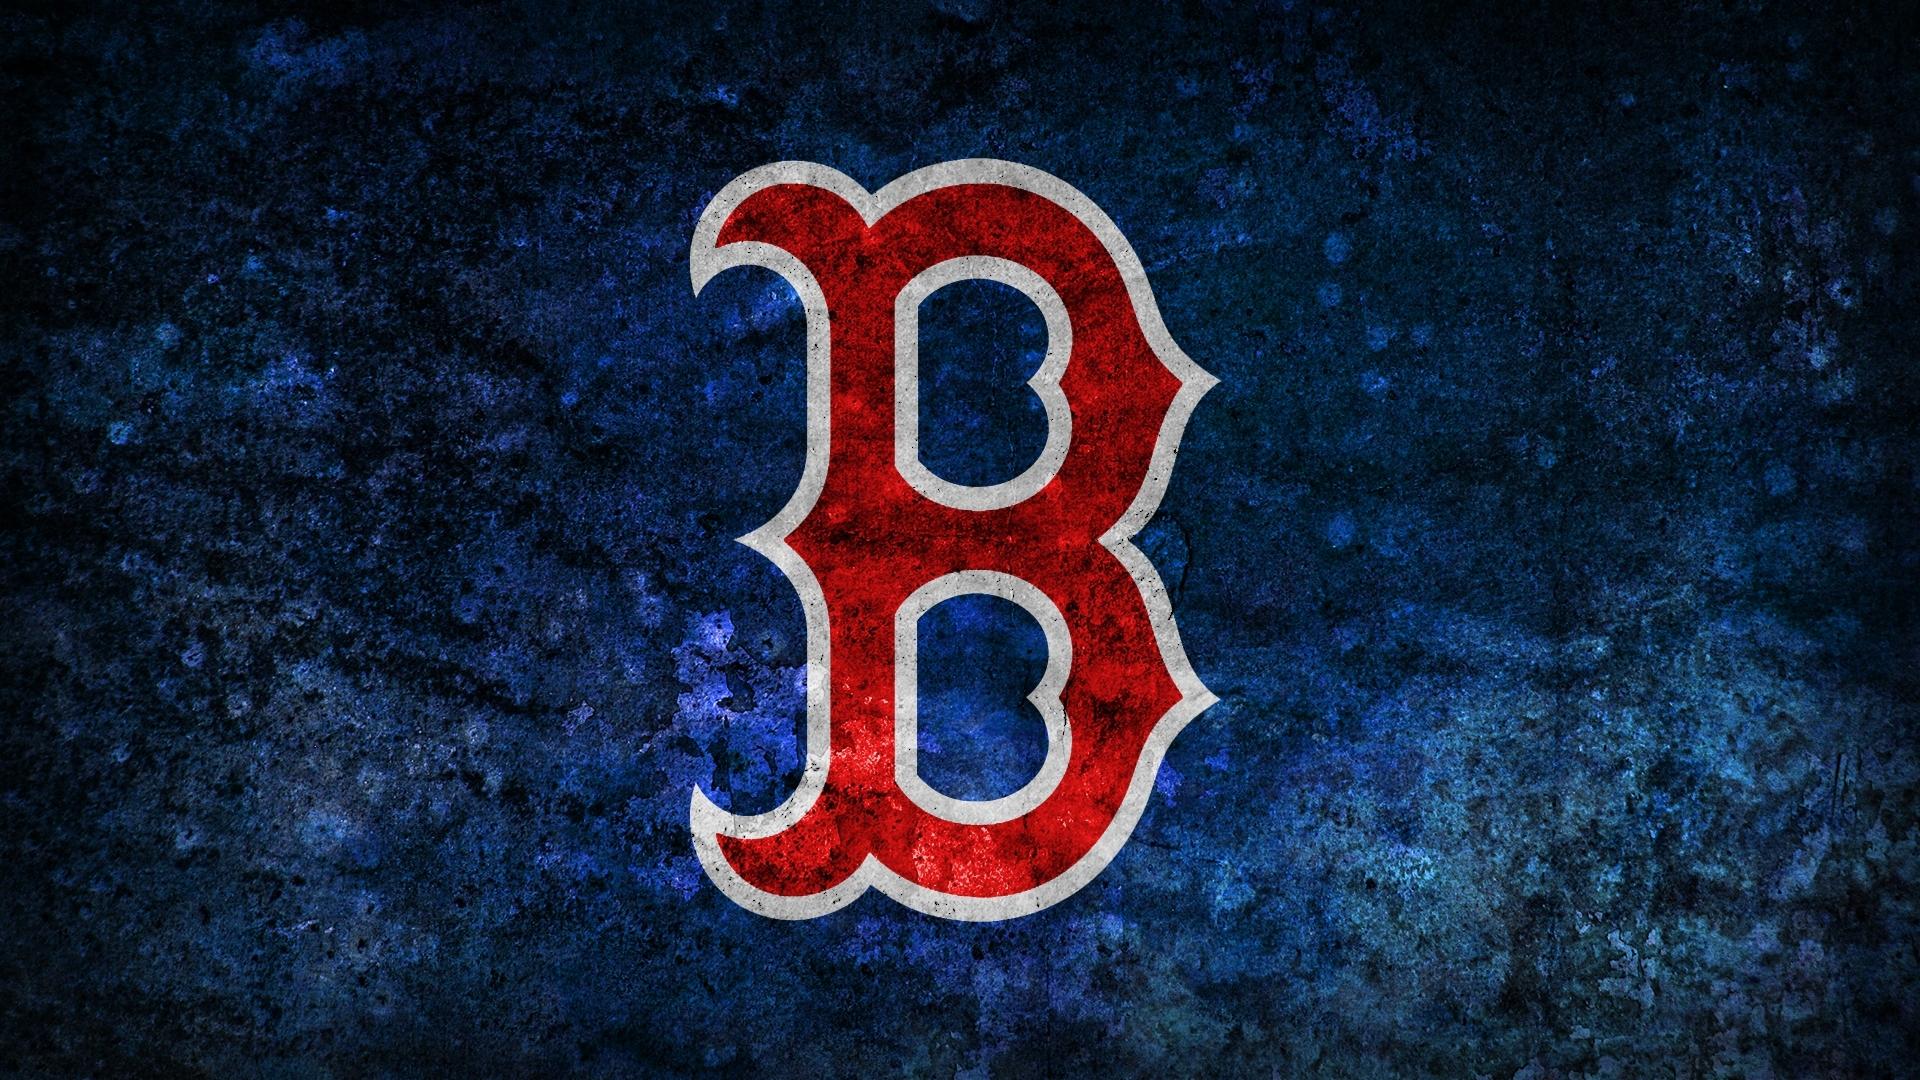 boston red sox backgrounds free download | pixelstalk